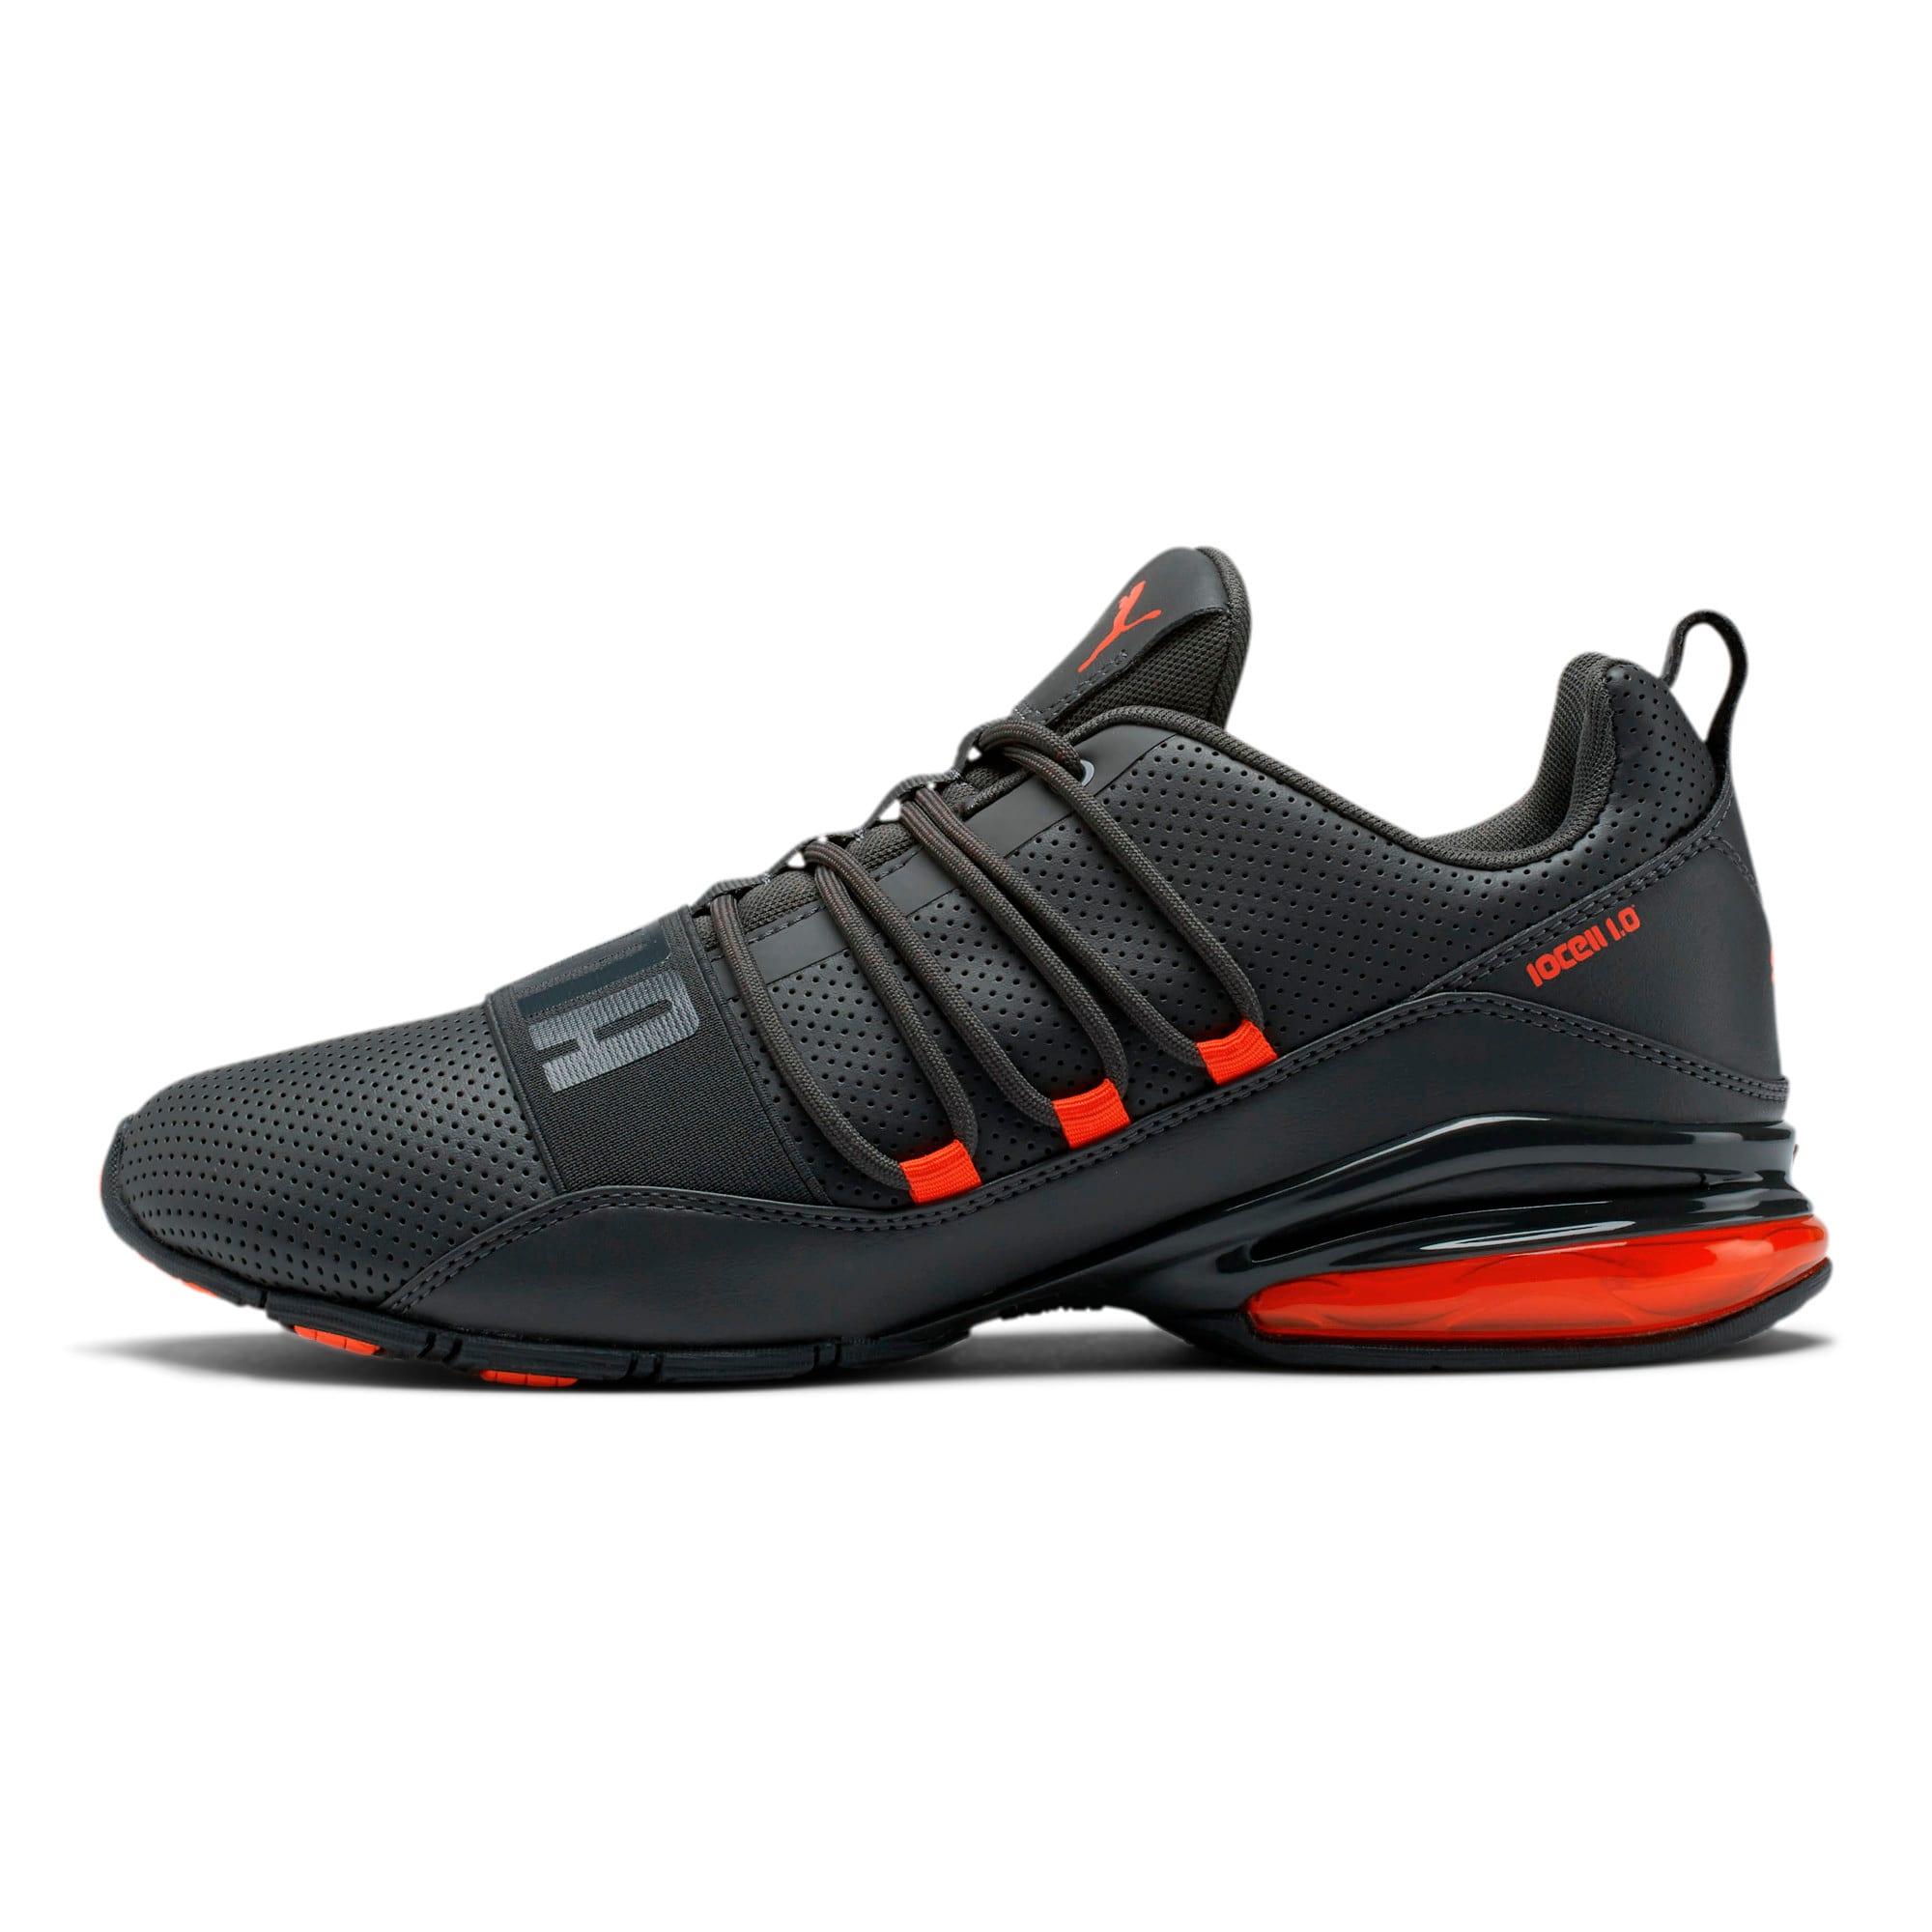 Thumbnail 1 of Cell Regulate Men's Running Shoes, Dark Shadow-Nrgy Red, medium